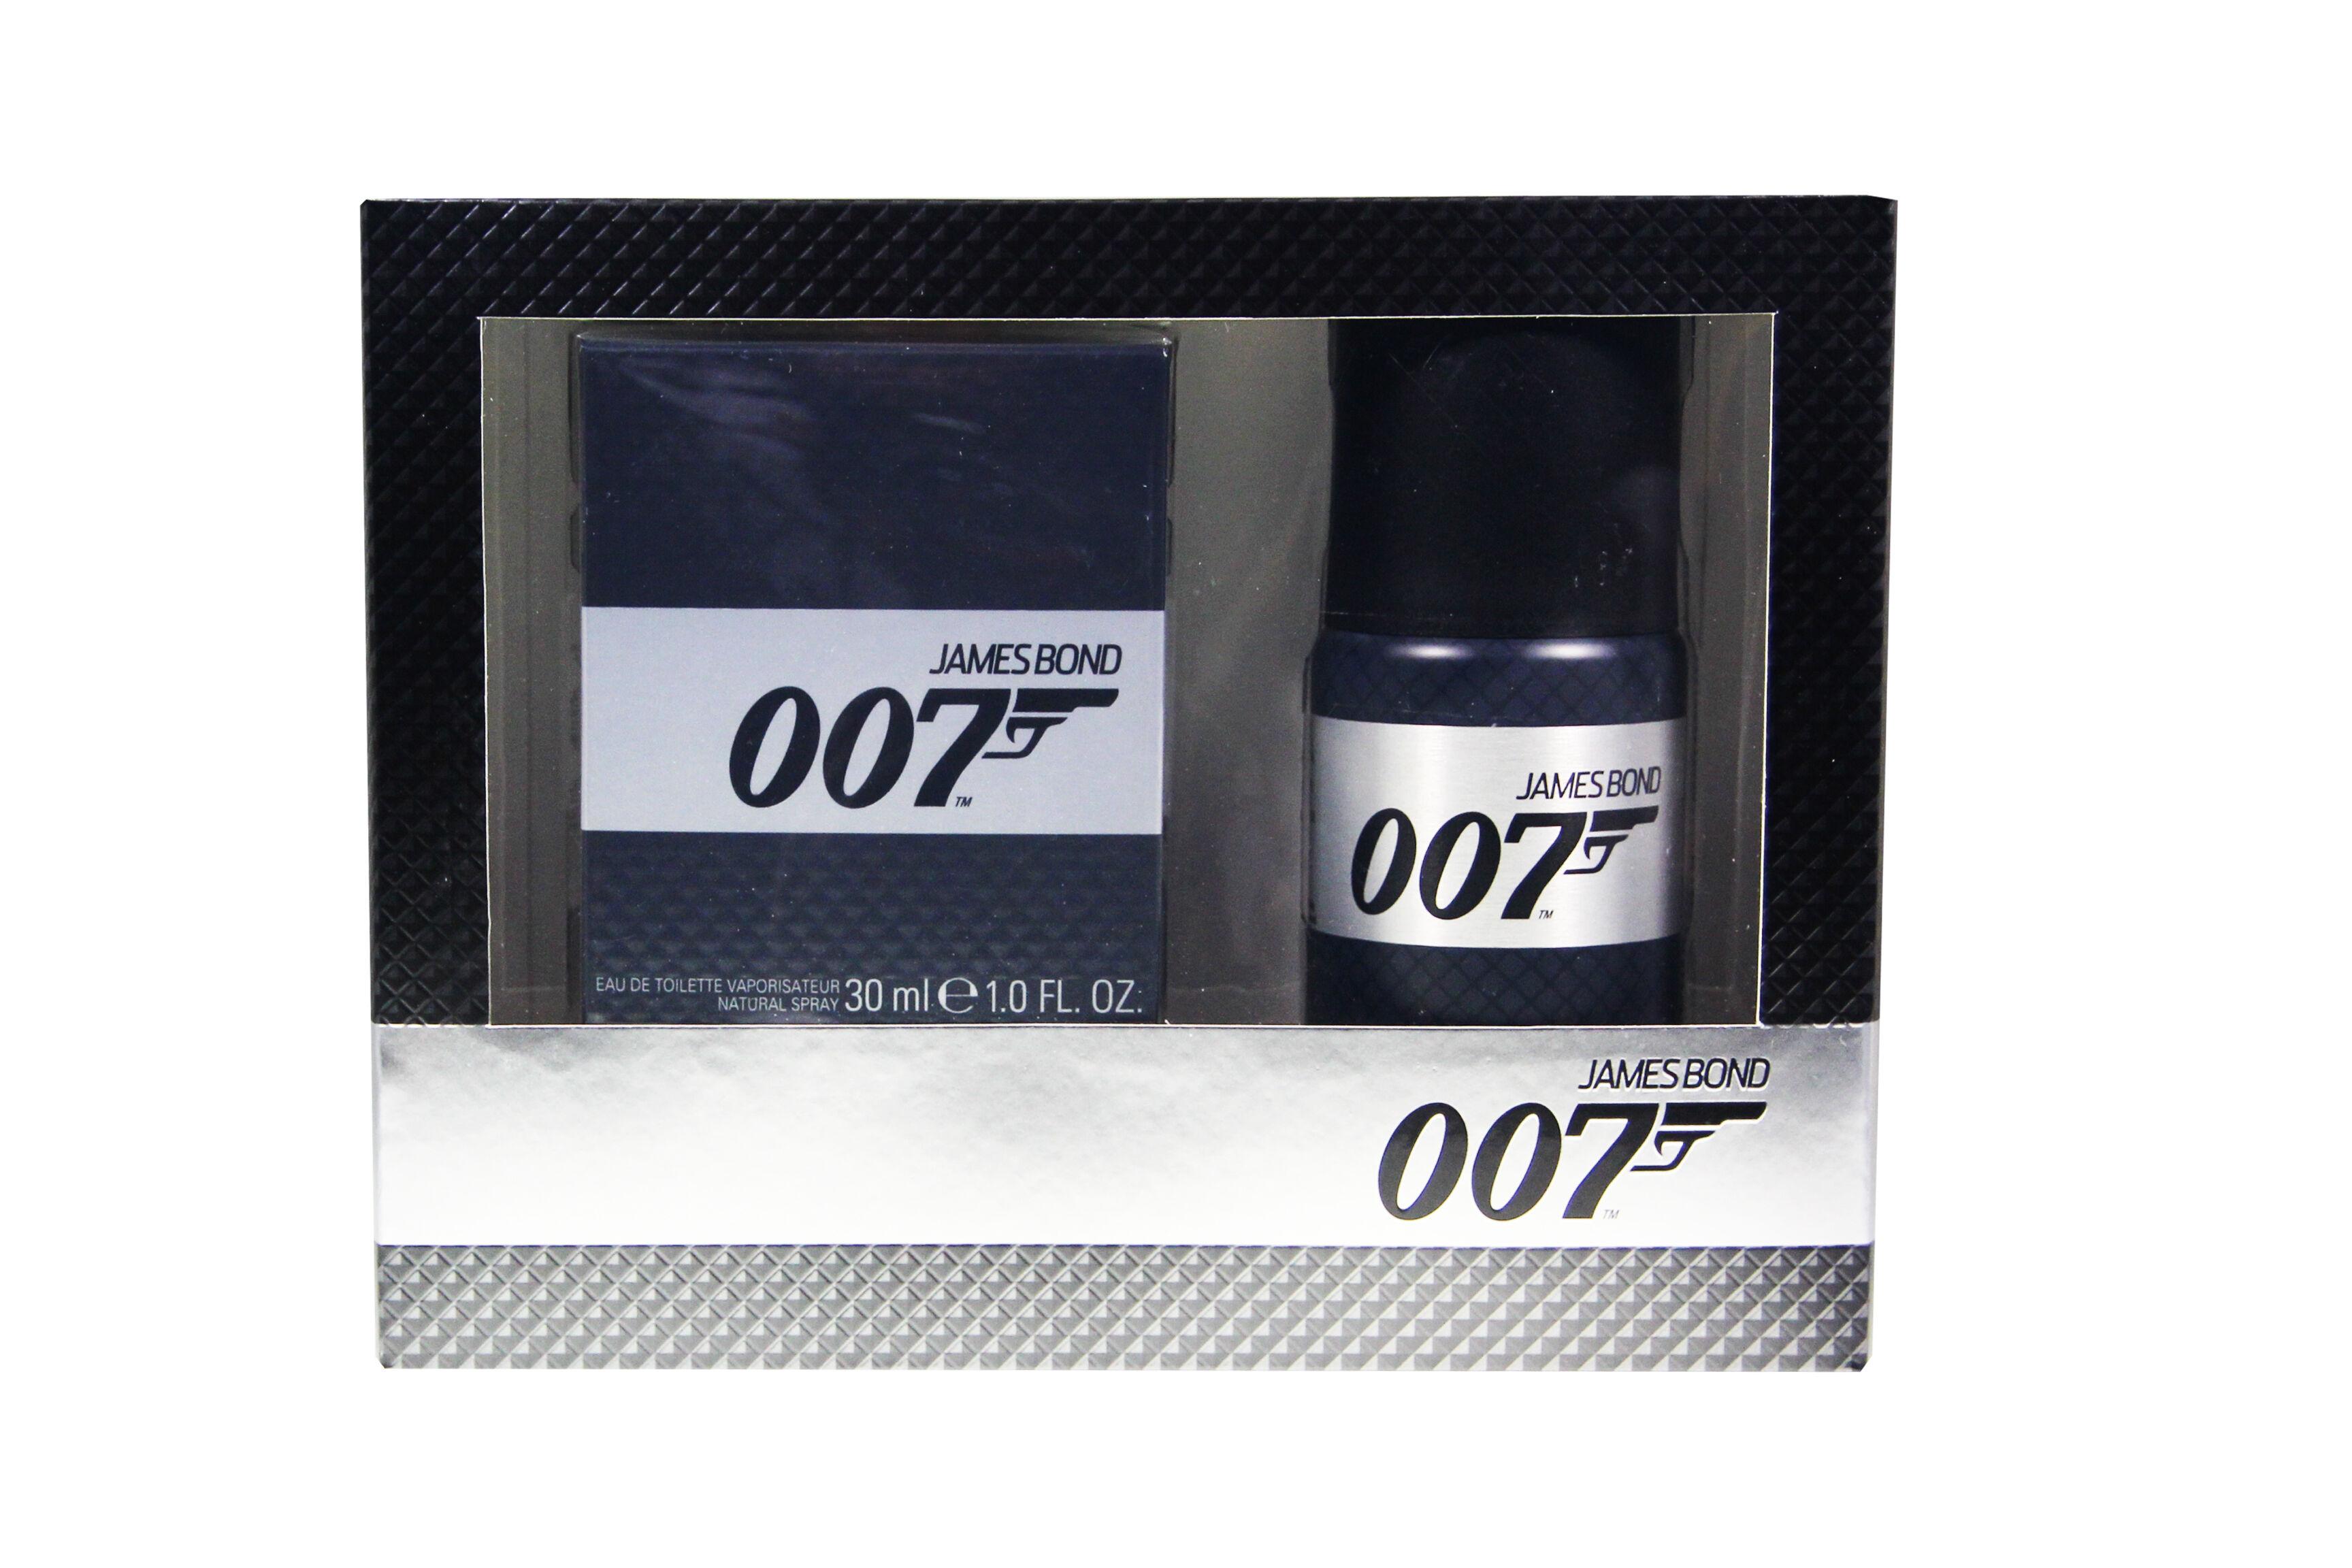 James Bond 007 EDT 30 ml + Deodorant Spray 150 ml Giftset